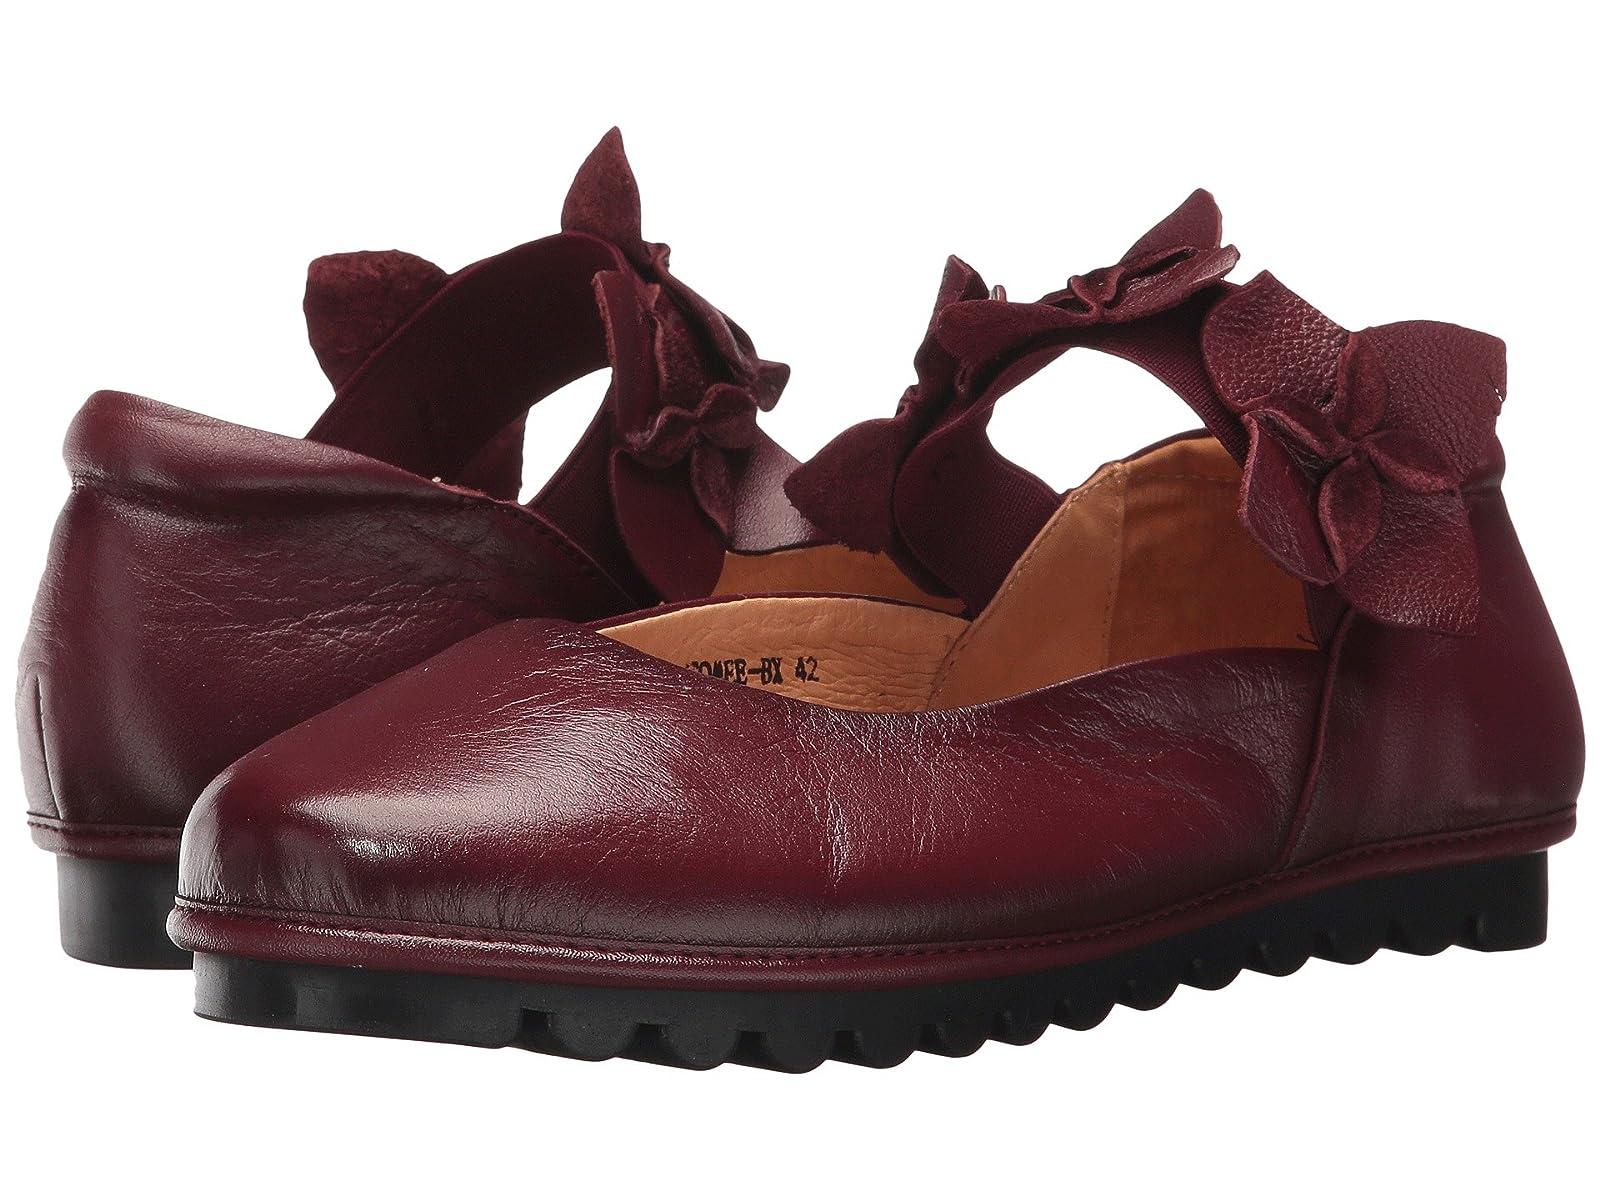 L'Artiste by Spring Step TomeeAtmospheric grades have affordable shoes